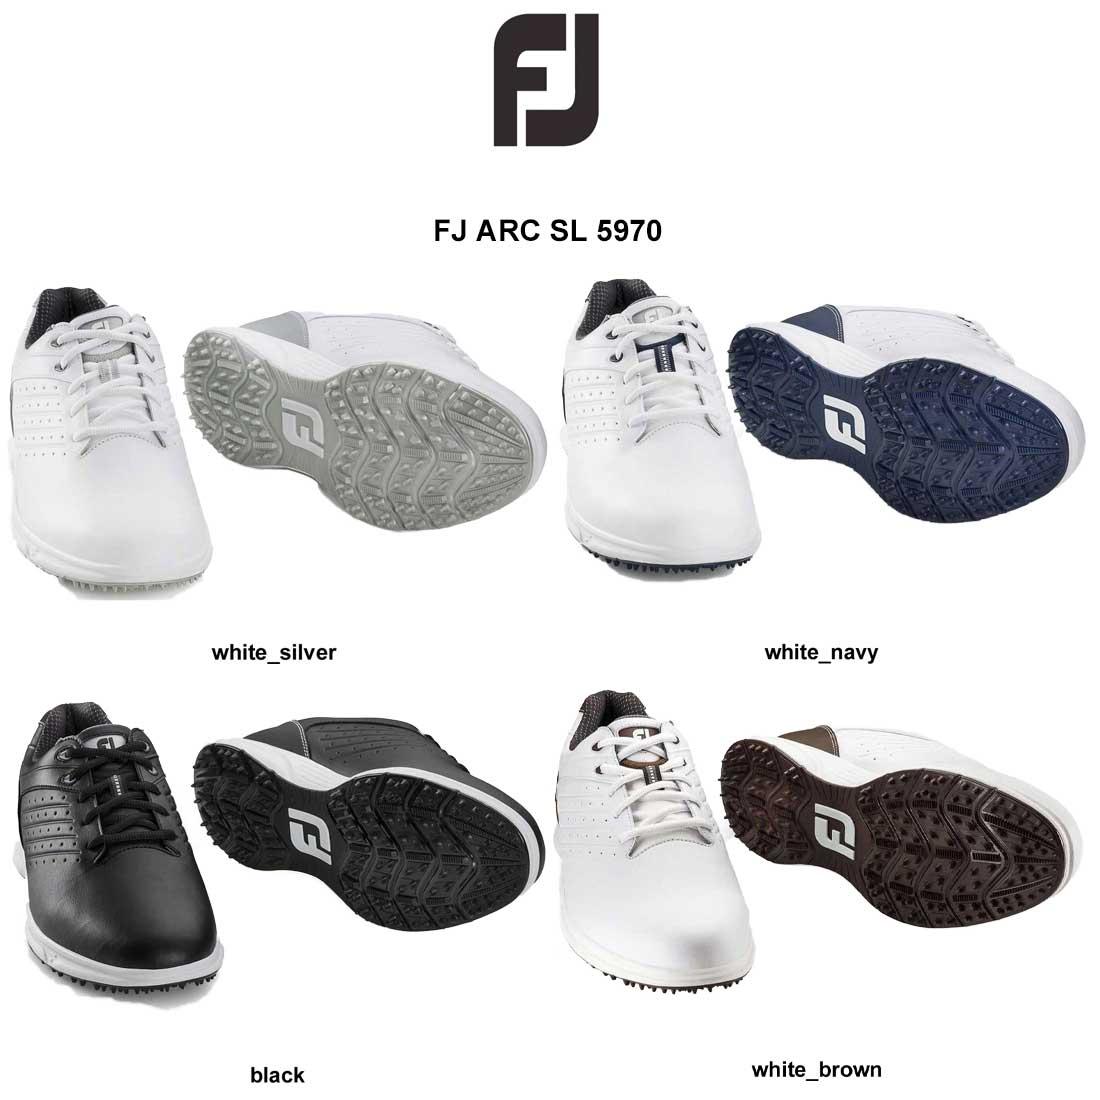 Foot Joy(フットジョイ)ゴルフシューズ スパイクレス 幅M(2E) メンズ FJ ARC SL 5970